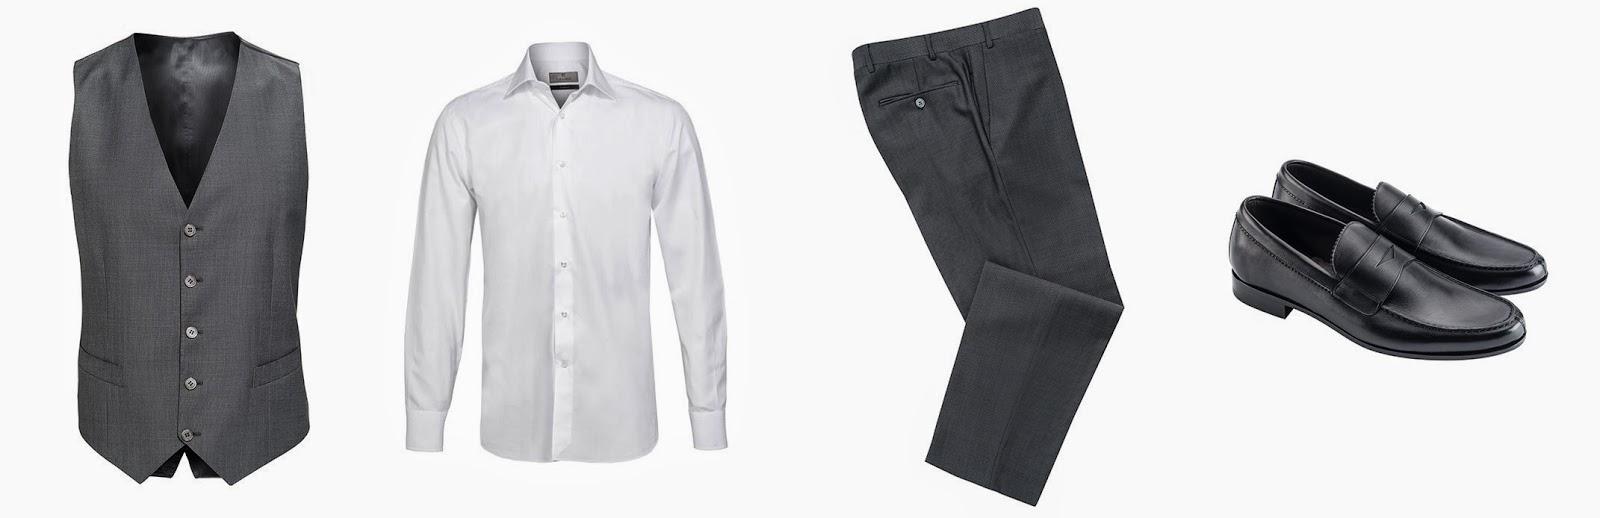 Ludovico Einaudi, Canali, menswear, Suits and Shirts,